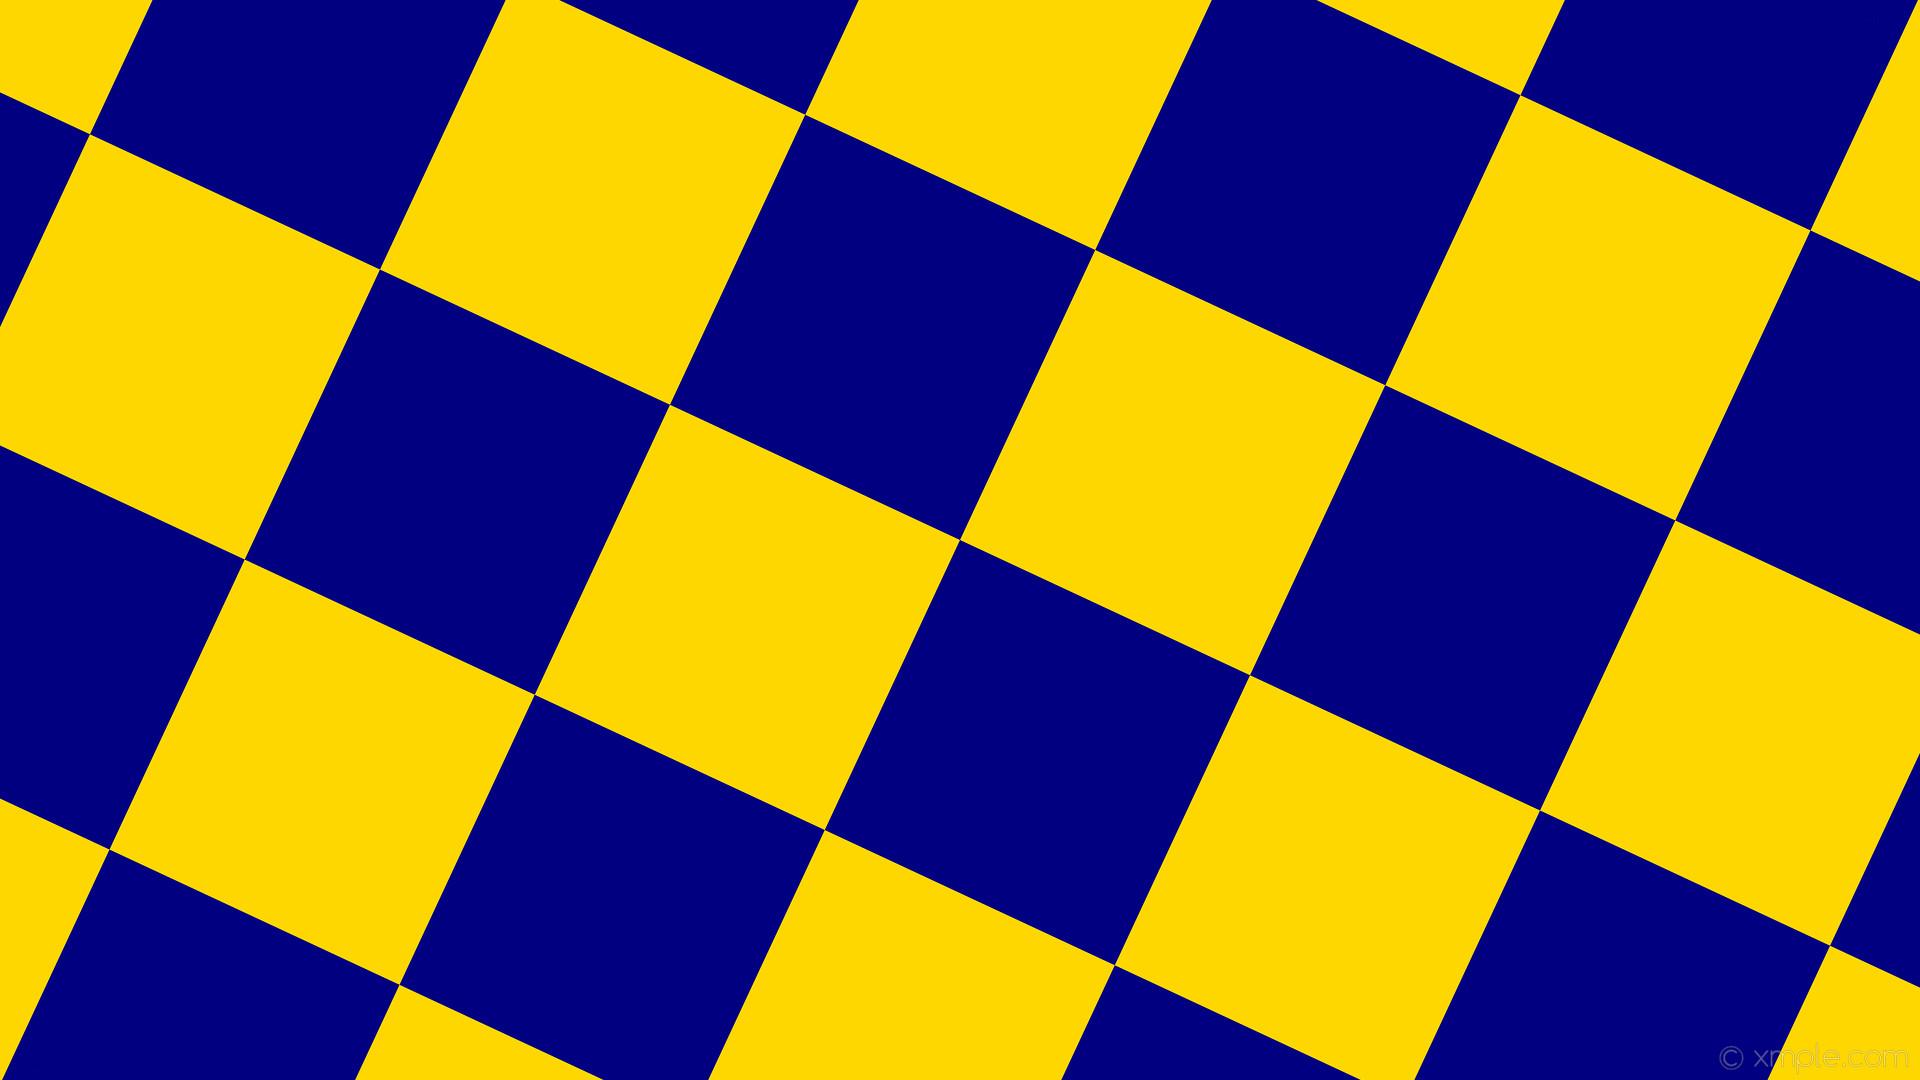 wallpaper squares yellow checkered blue gold navy #ffd700 #000080 diagonal  65° 320px